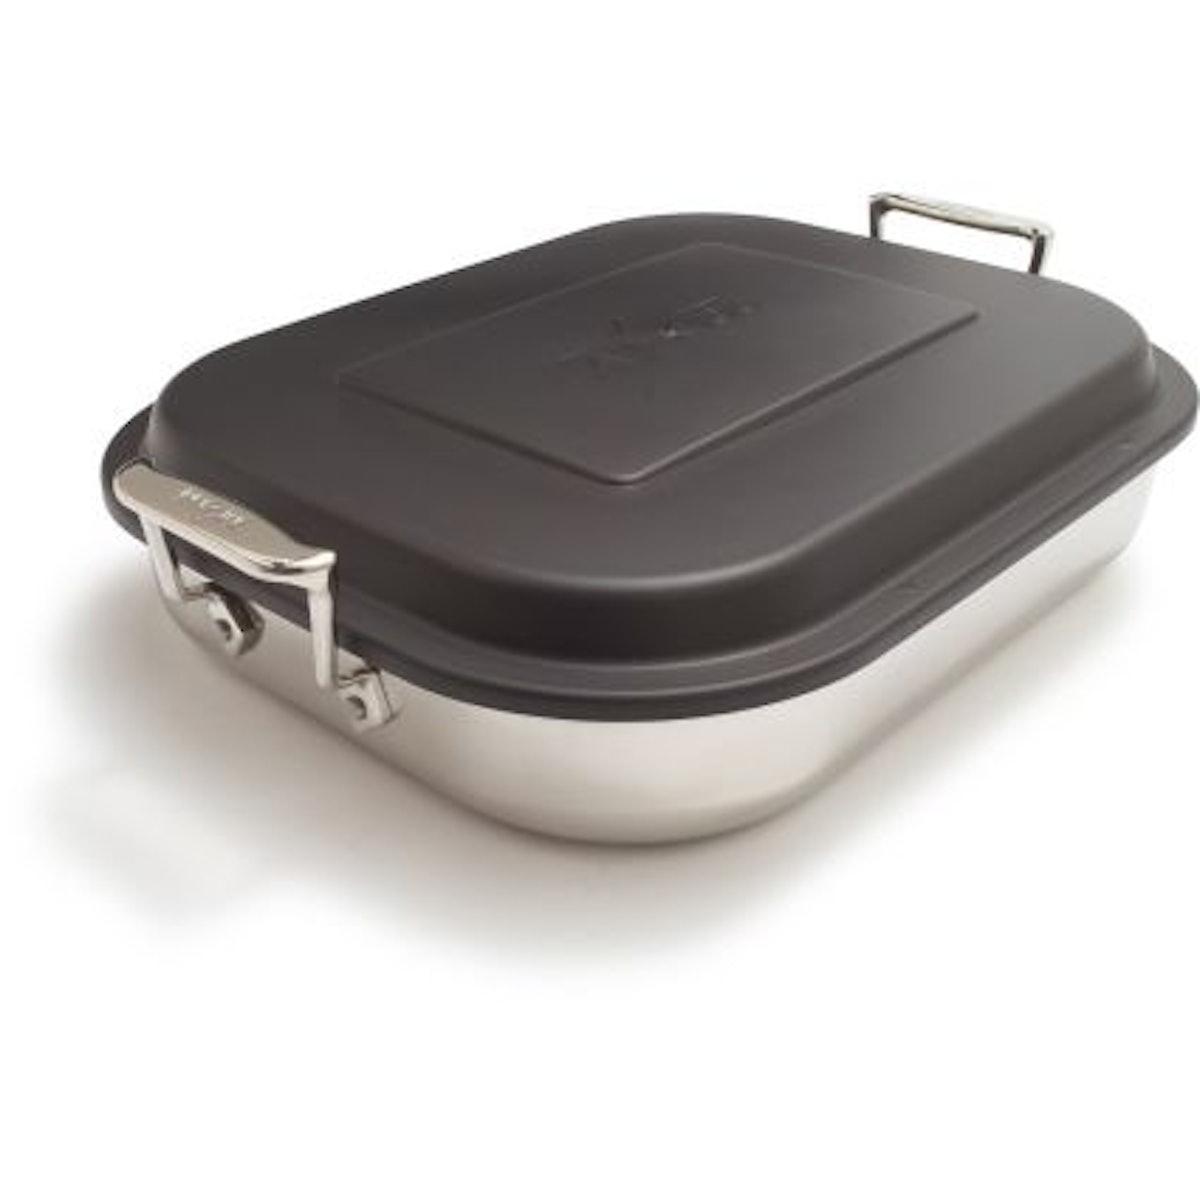 All-Clad Covered Lasagna Pan